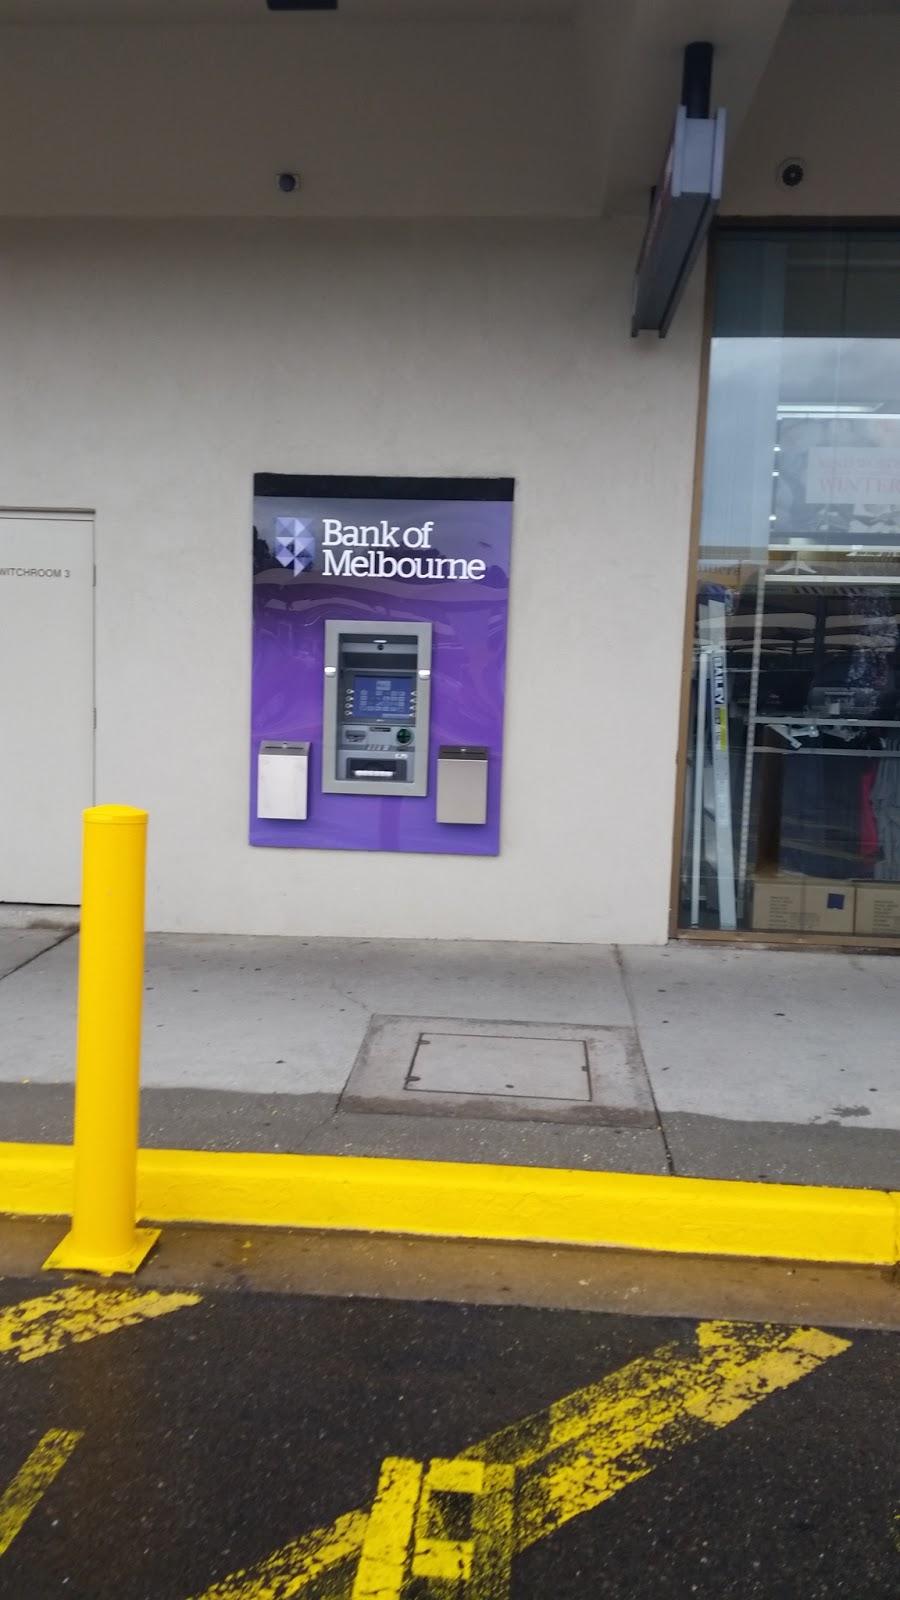 Bank of Melbourne ATM | atm | WODONGA PLAZA, O/S Shop/14a Elgin Blvd, Wodonga VIC 3690, Australia | 1800266352 OR +61 1800 266 352